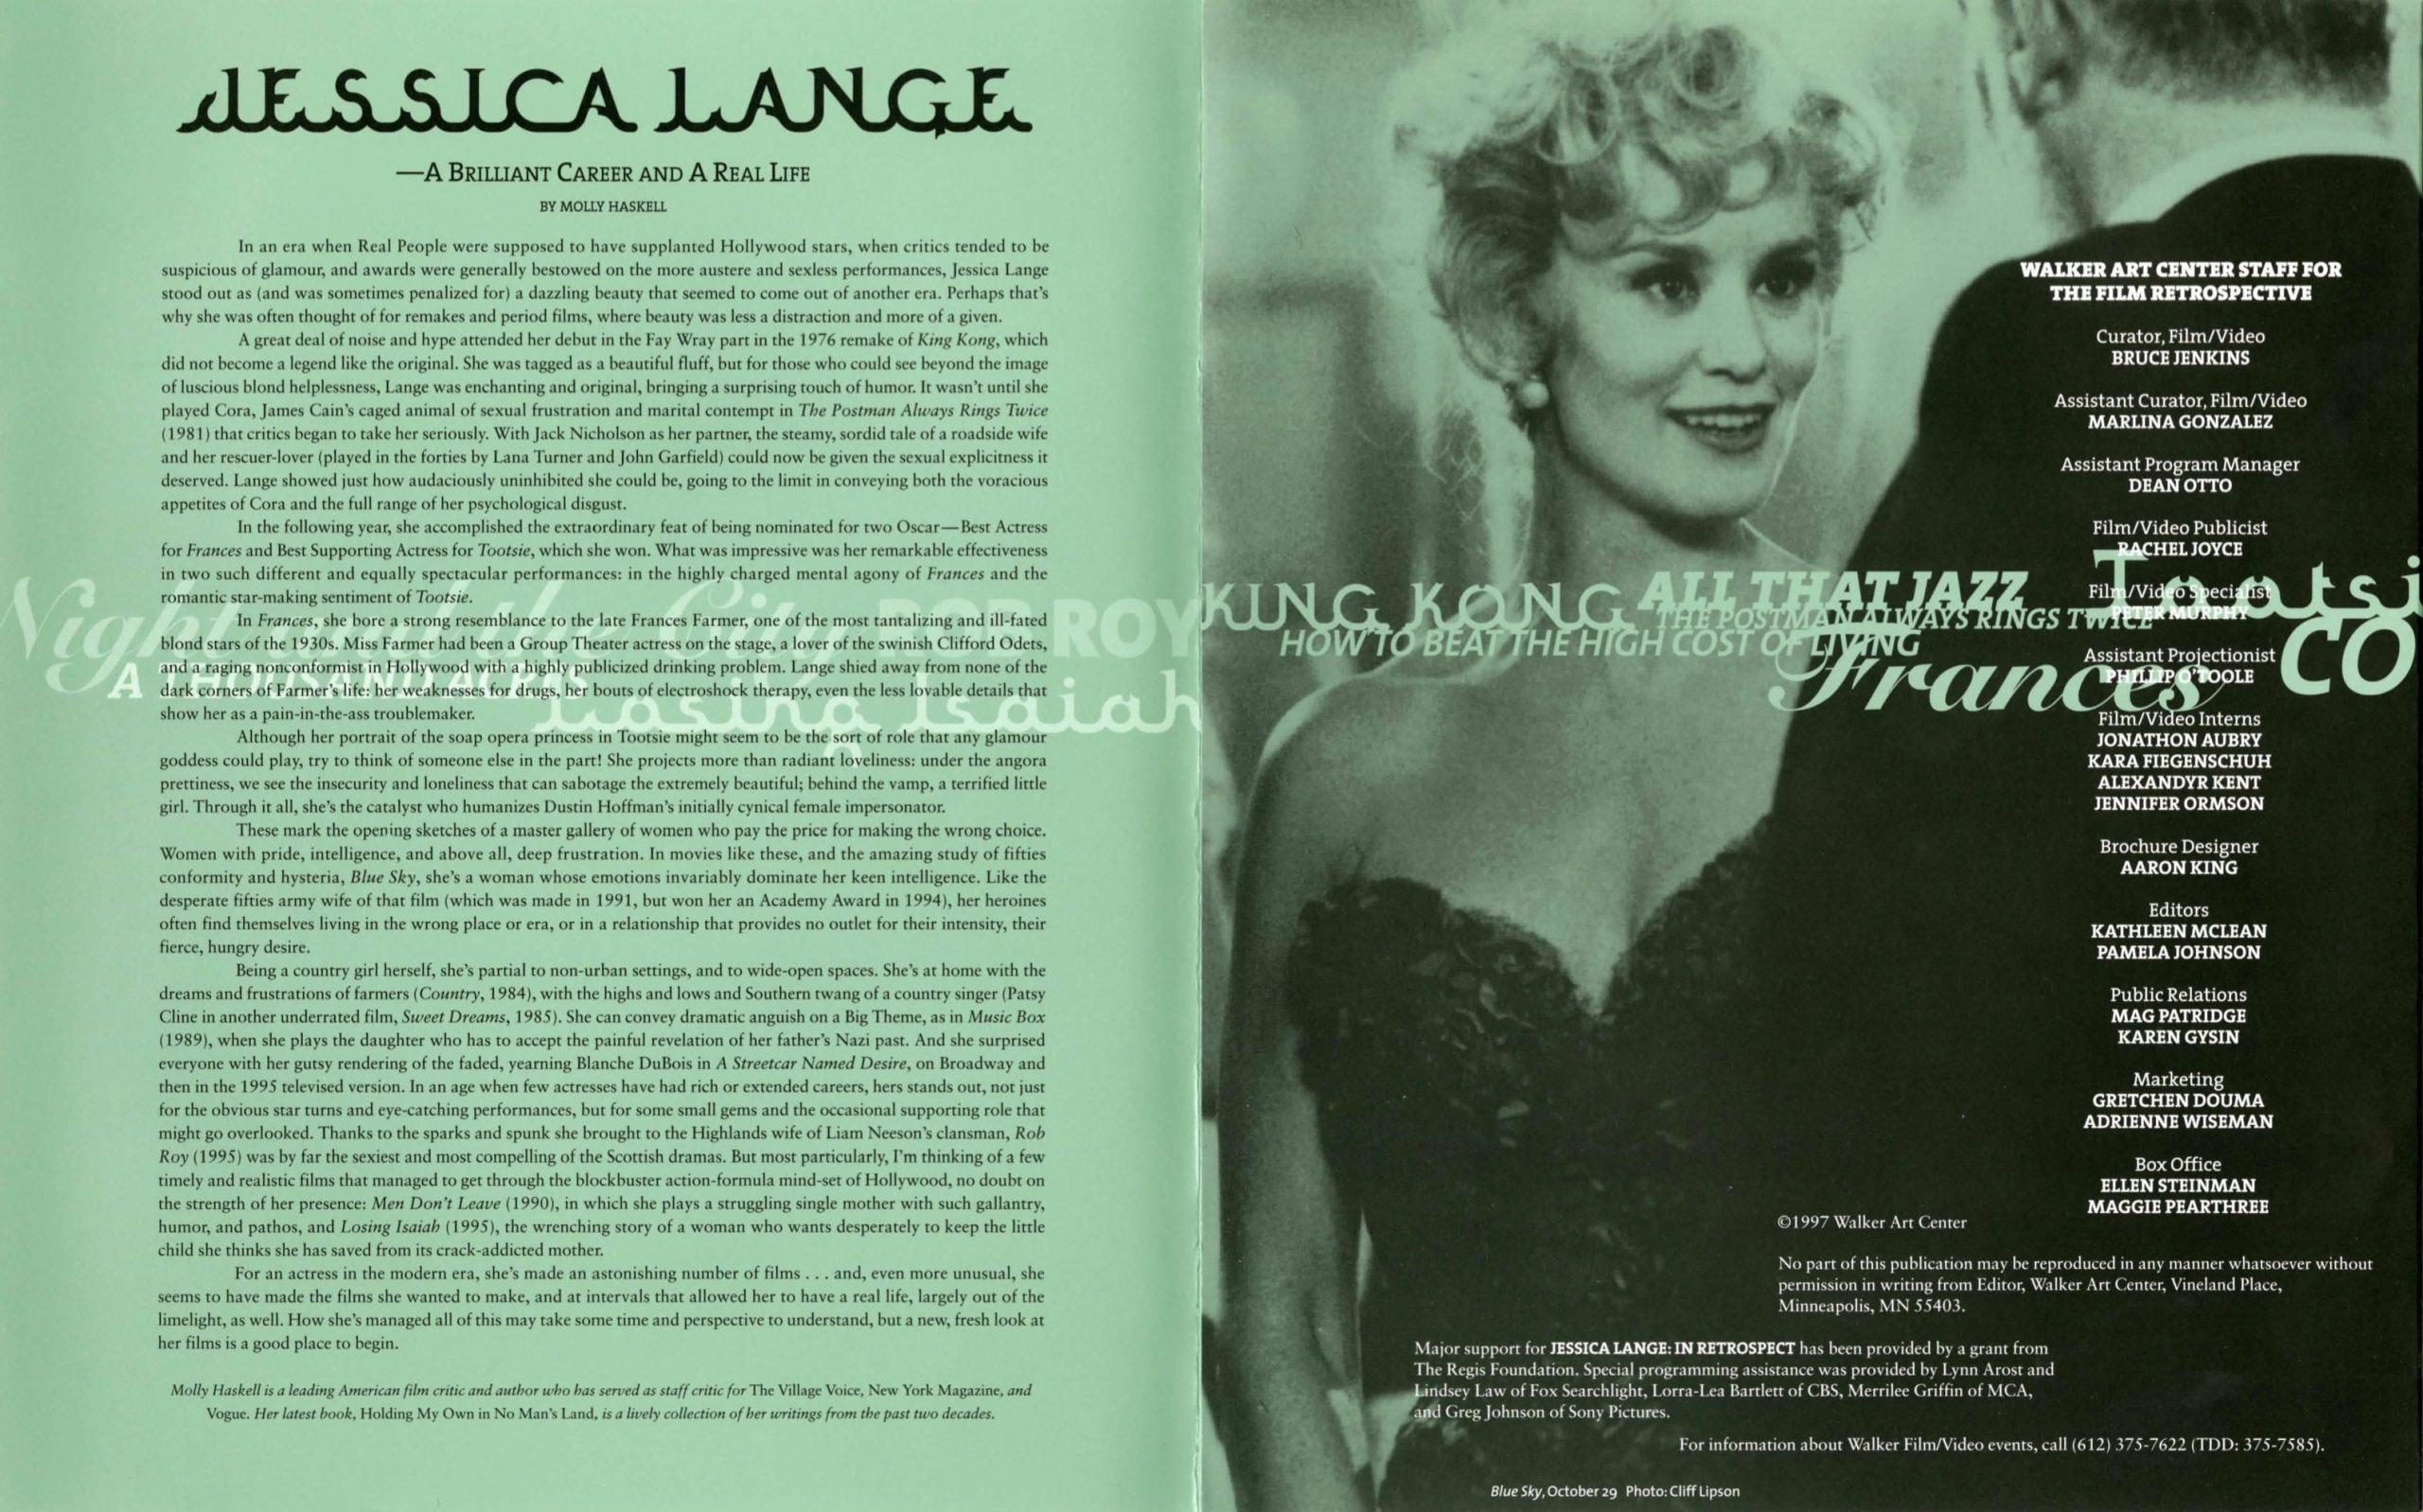 Jessica Lange brochure 2